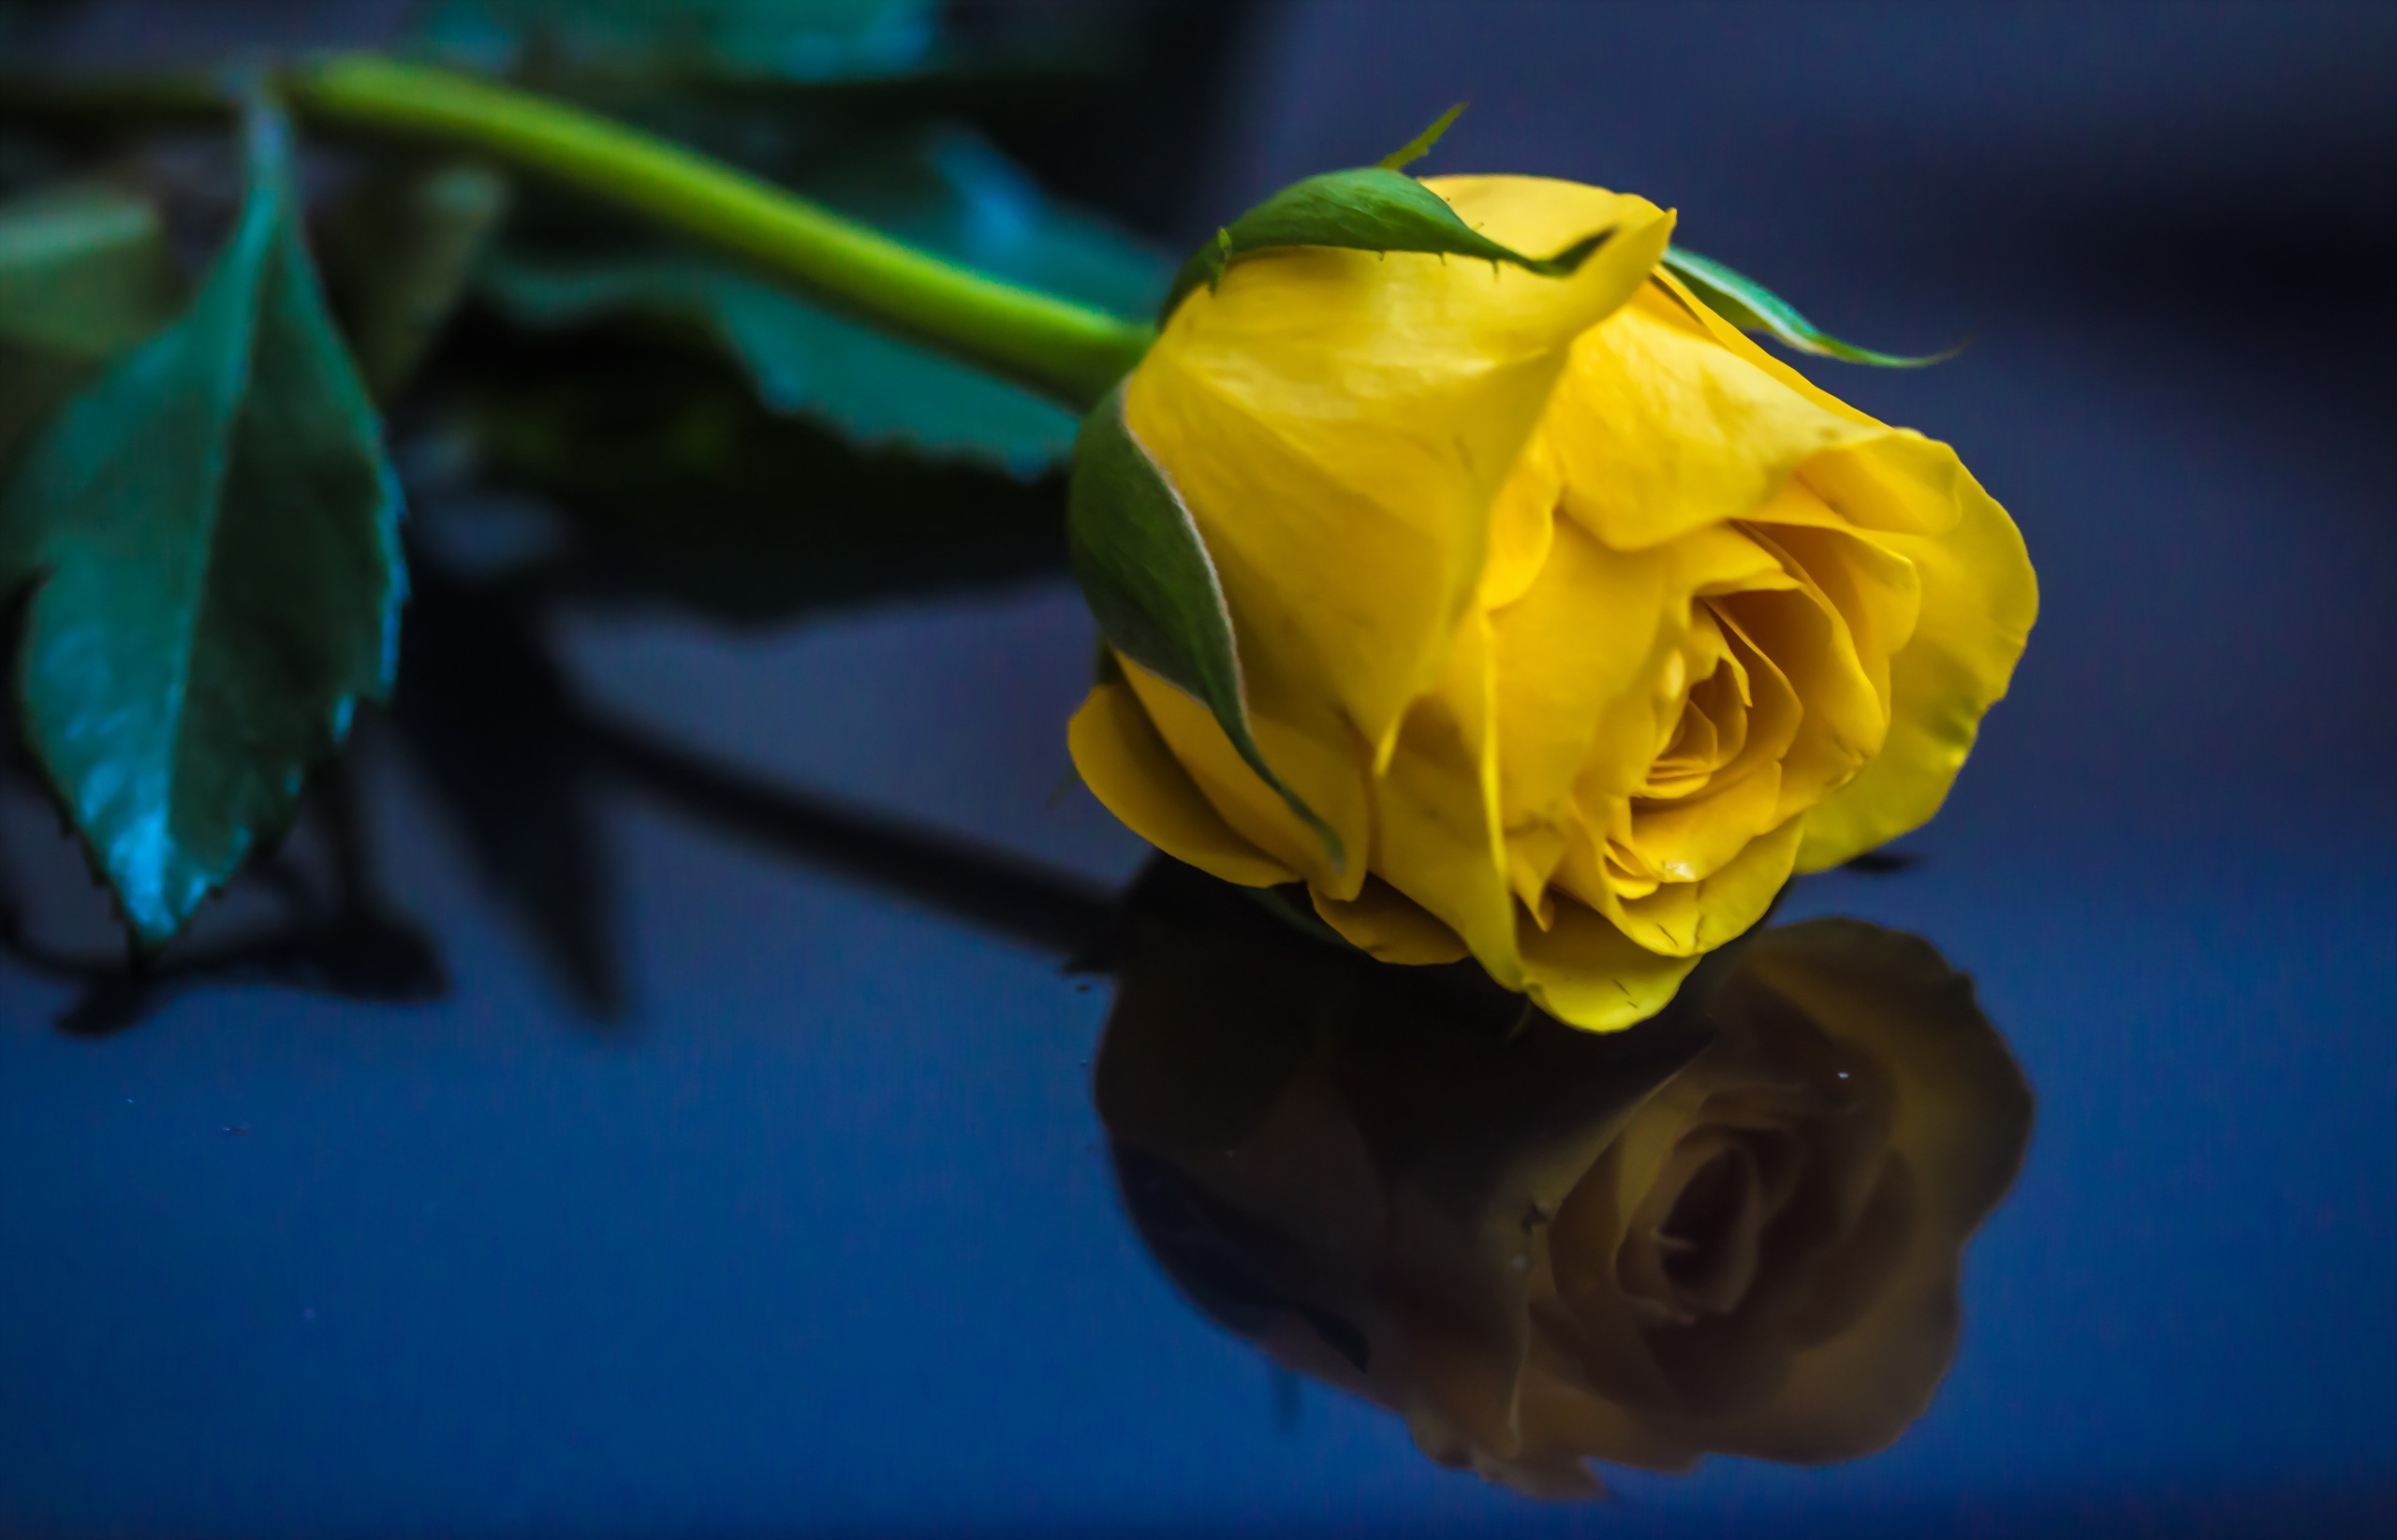 Картинка роза прости